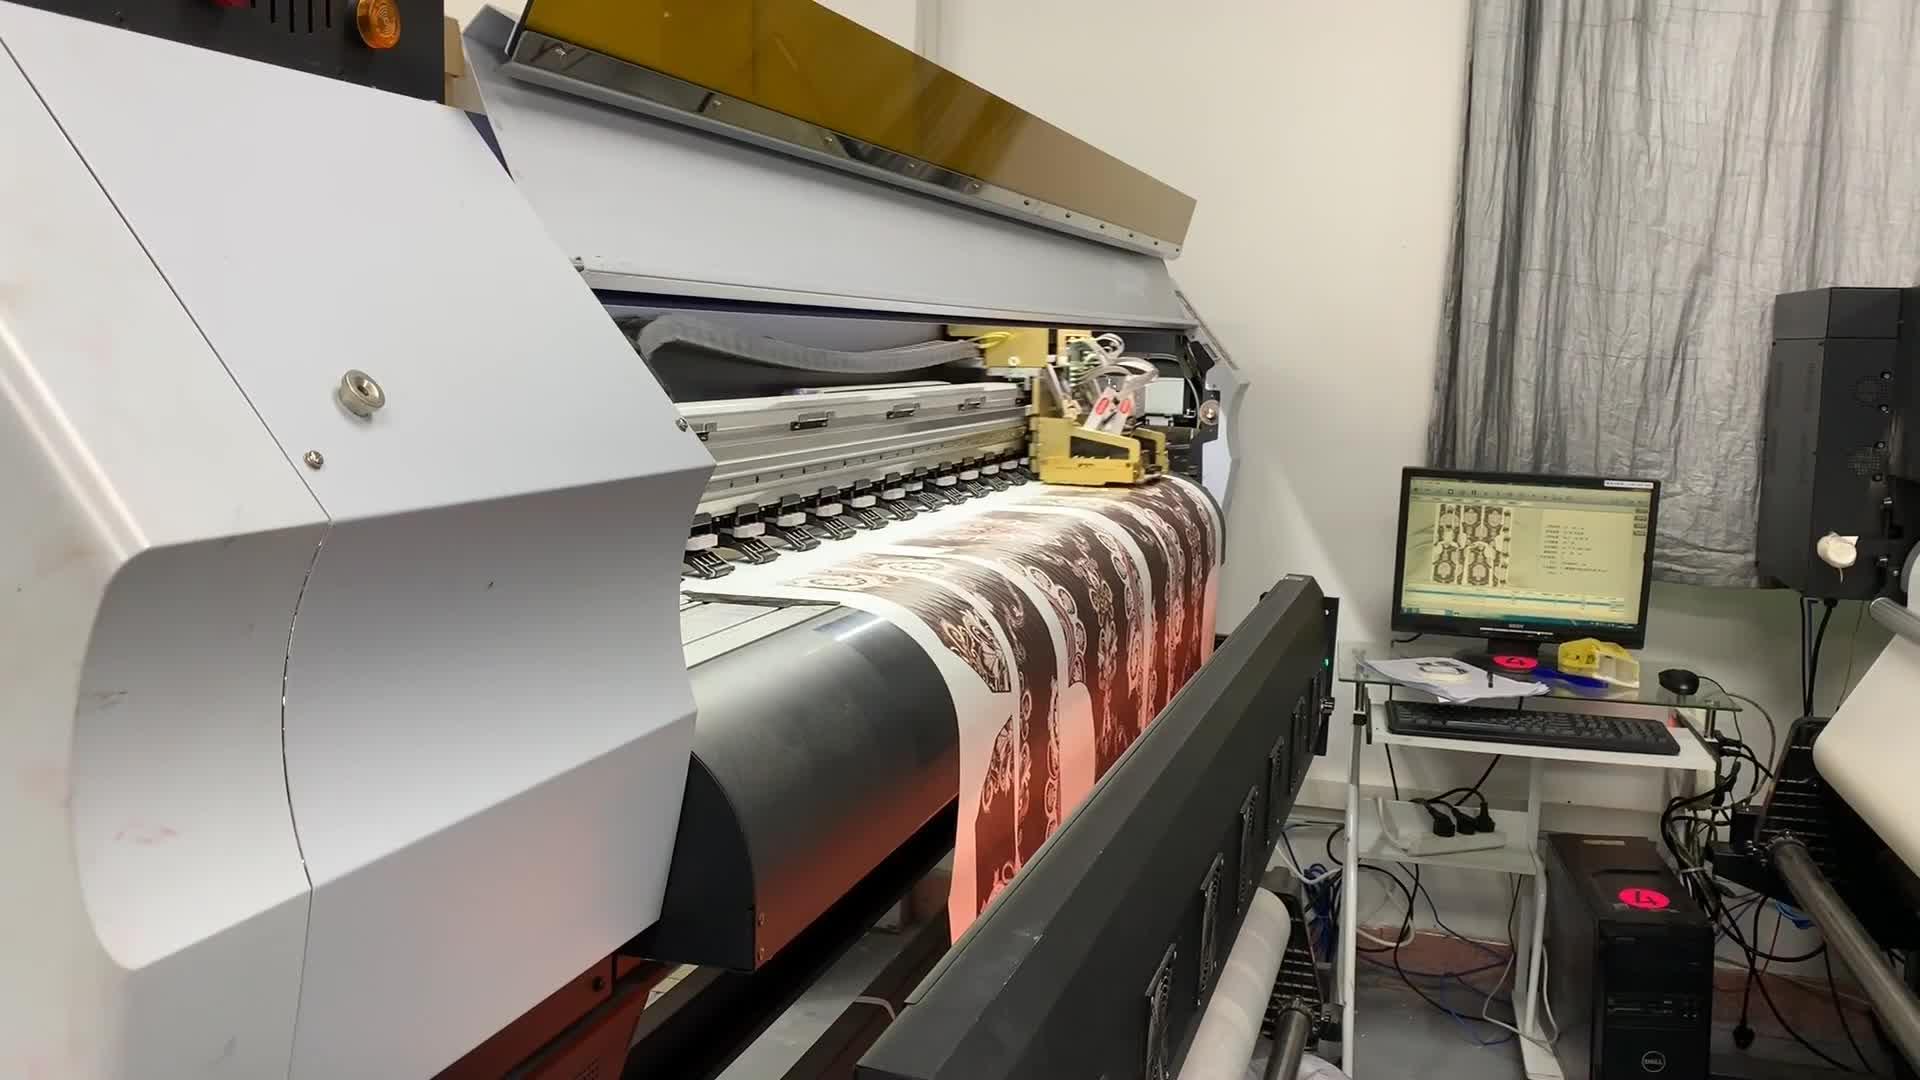 1.8 m digitale dye dublimation t-shirt drukmachine voor textiel roller afdrukken